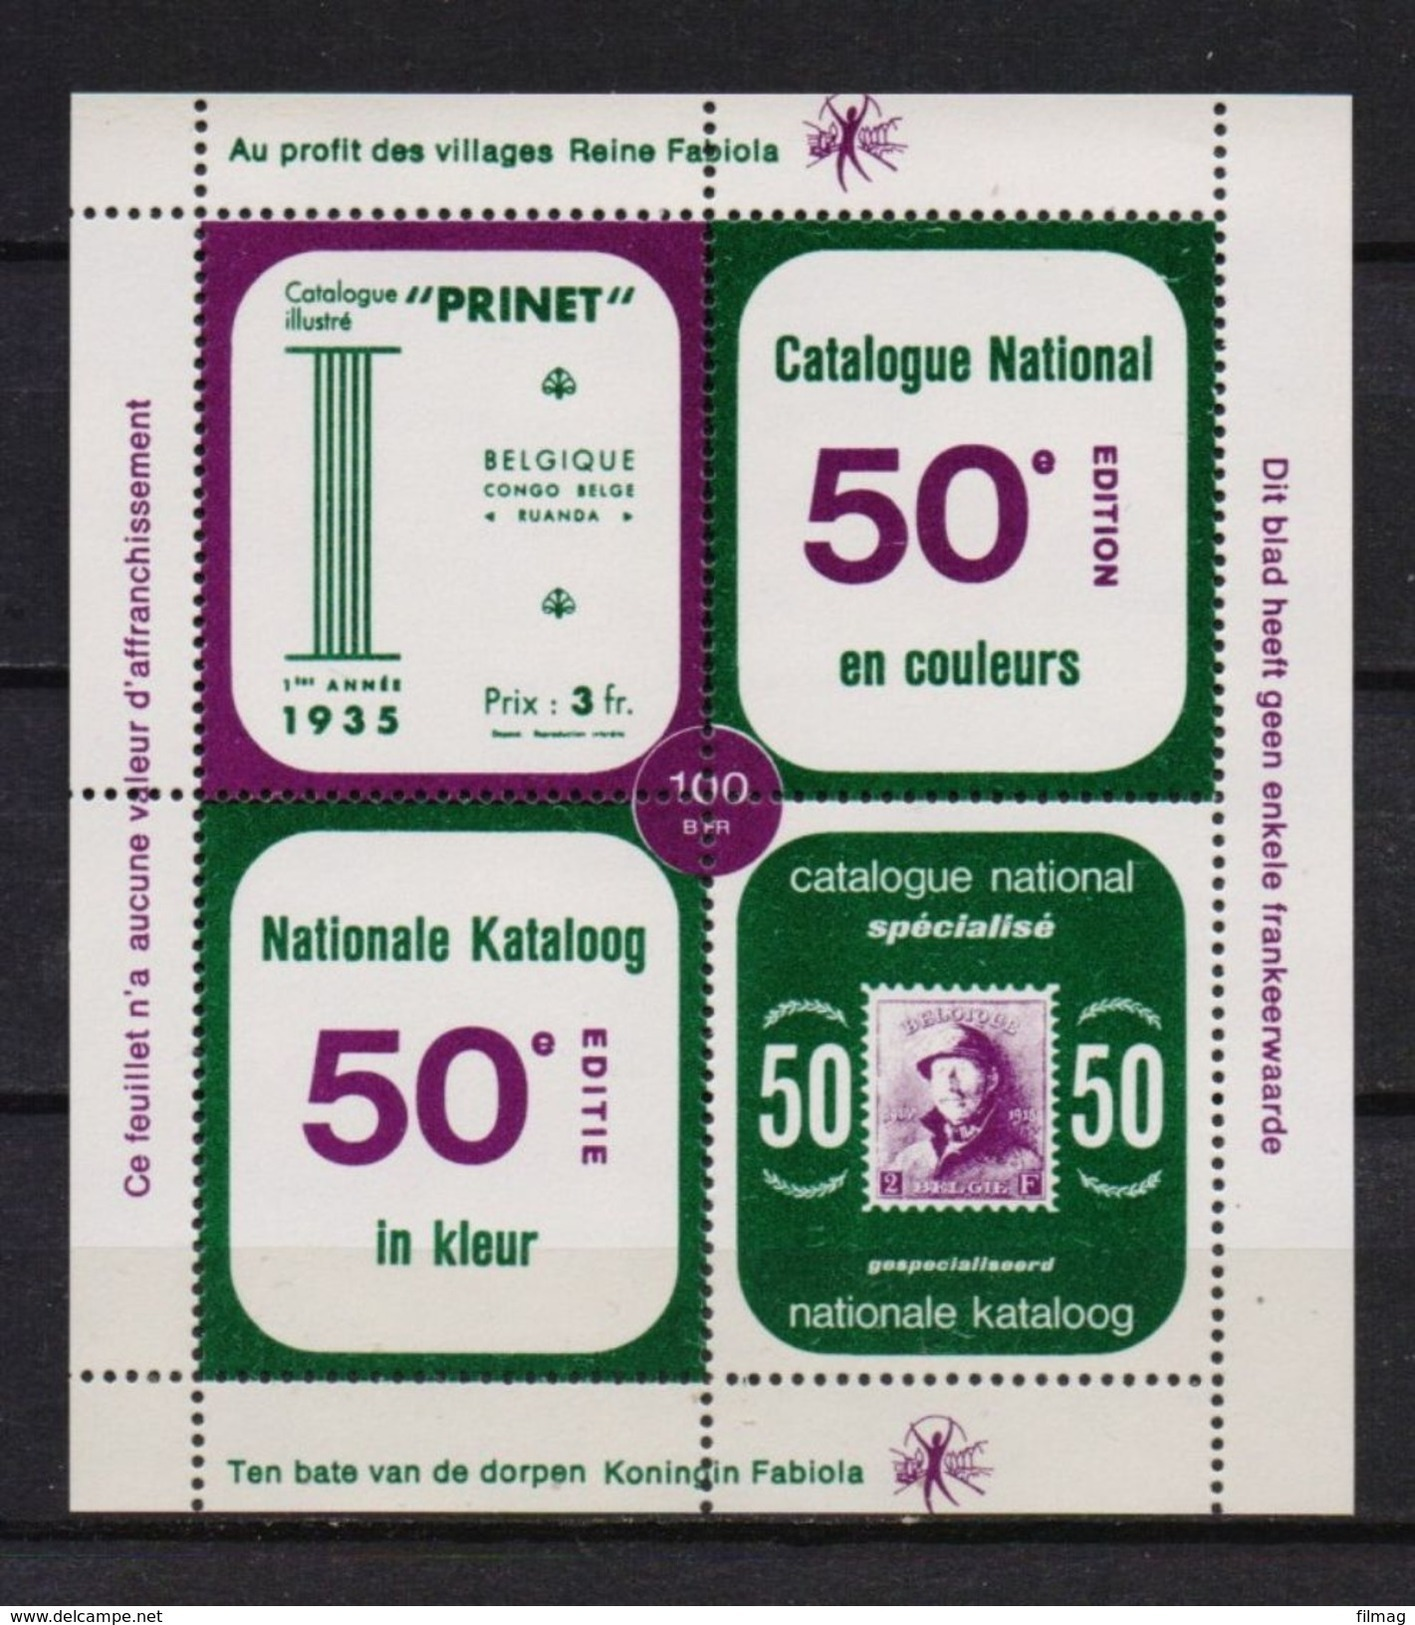 BLOKJE PRINET POSTFRIS** A208 - Commemorative Labels